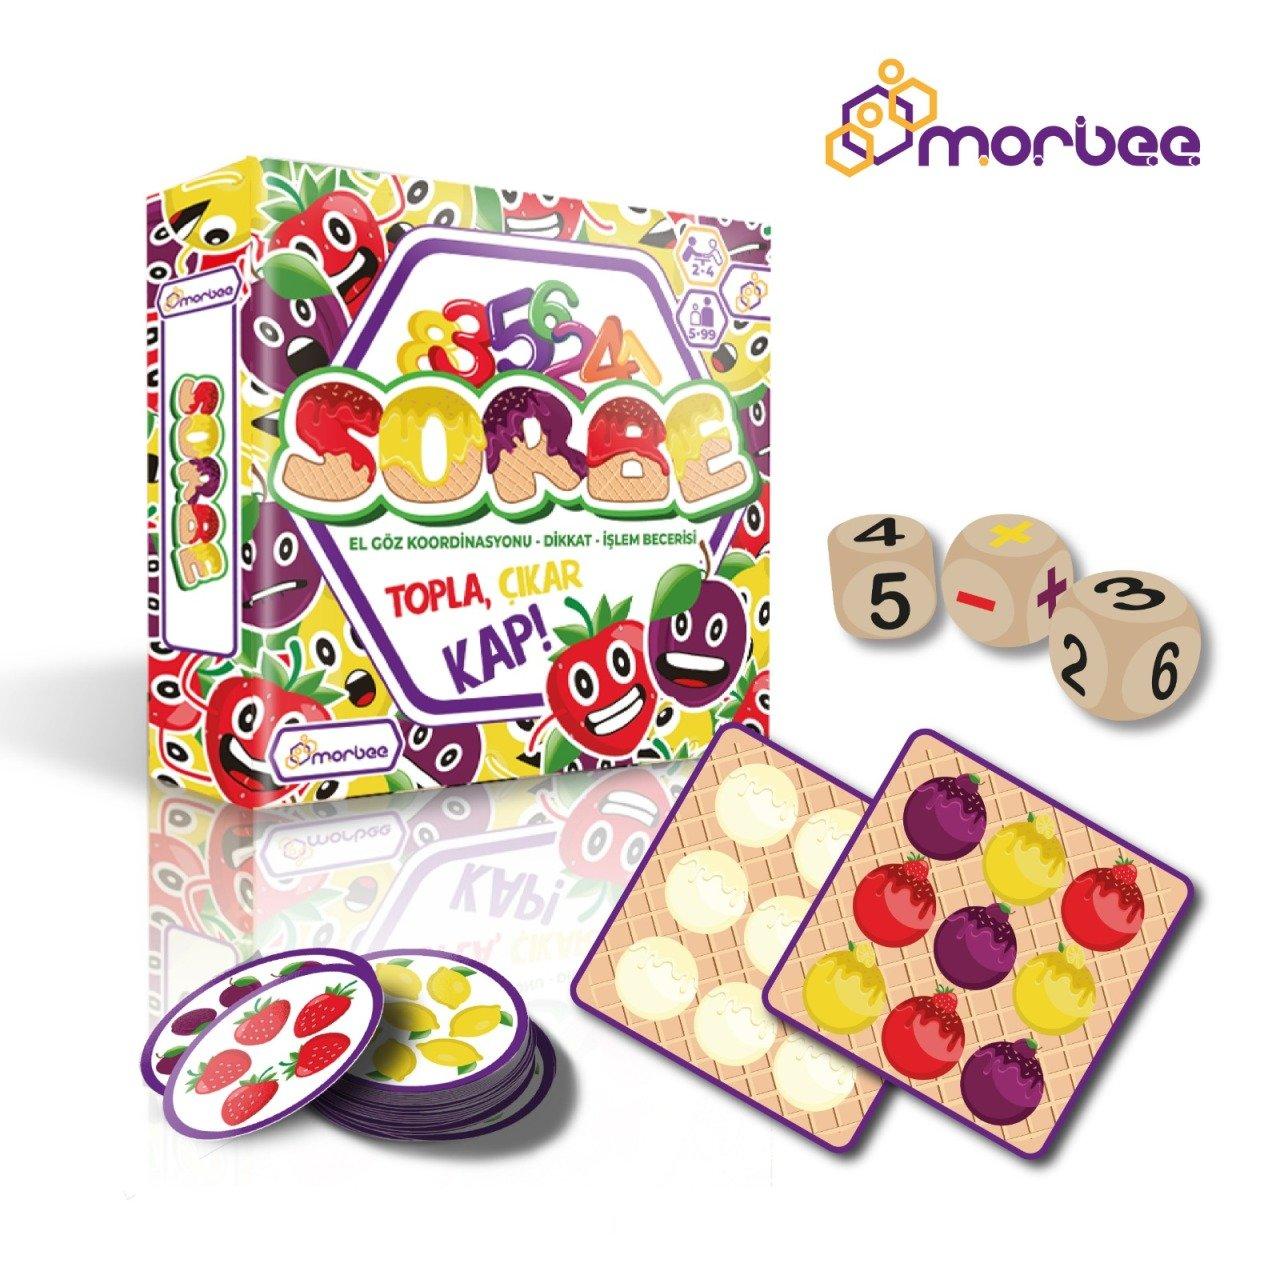 Morbee Sorbe 5 99 Yas Kutu Akil Oyunu Brainbox Com Tr